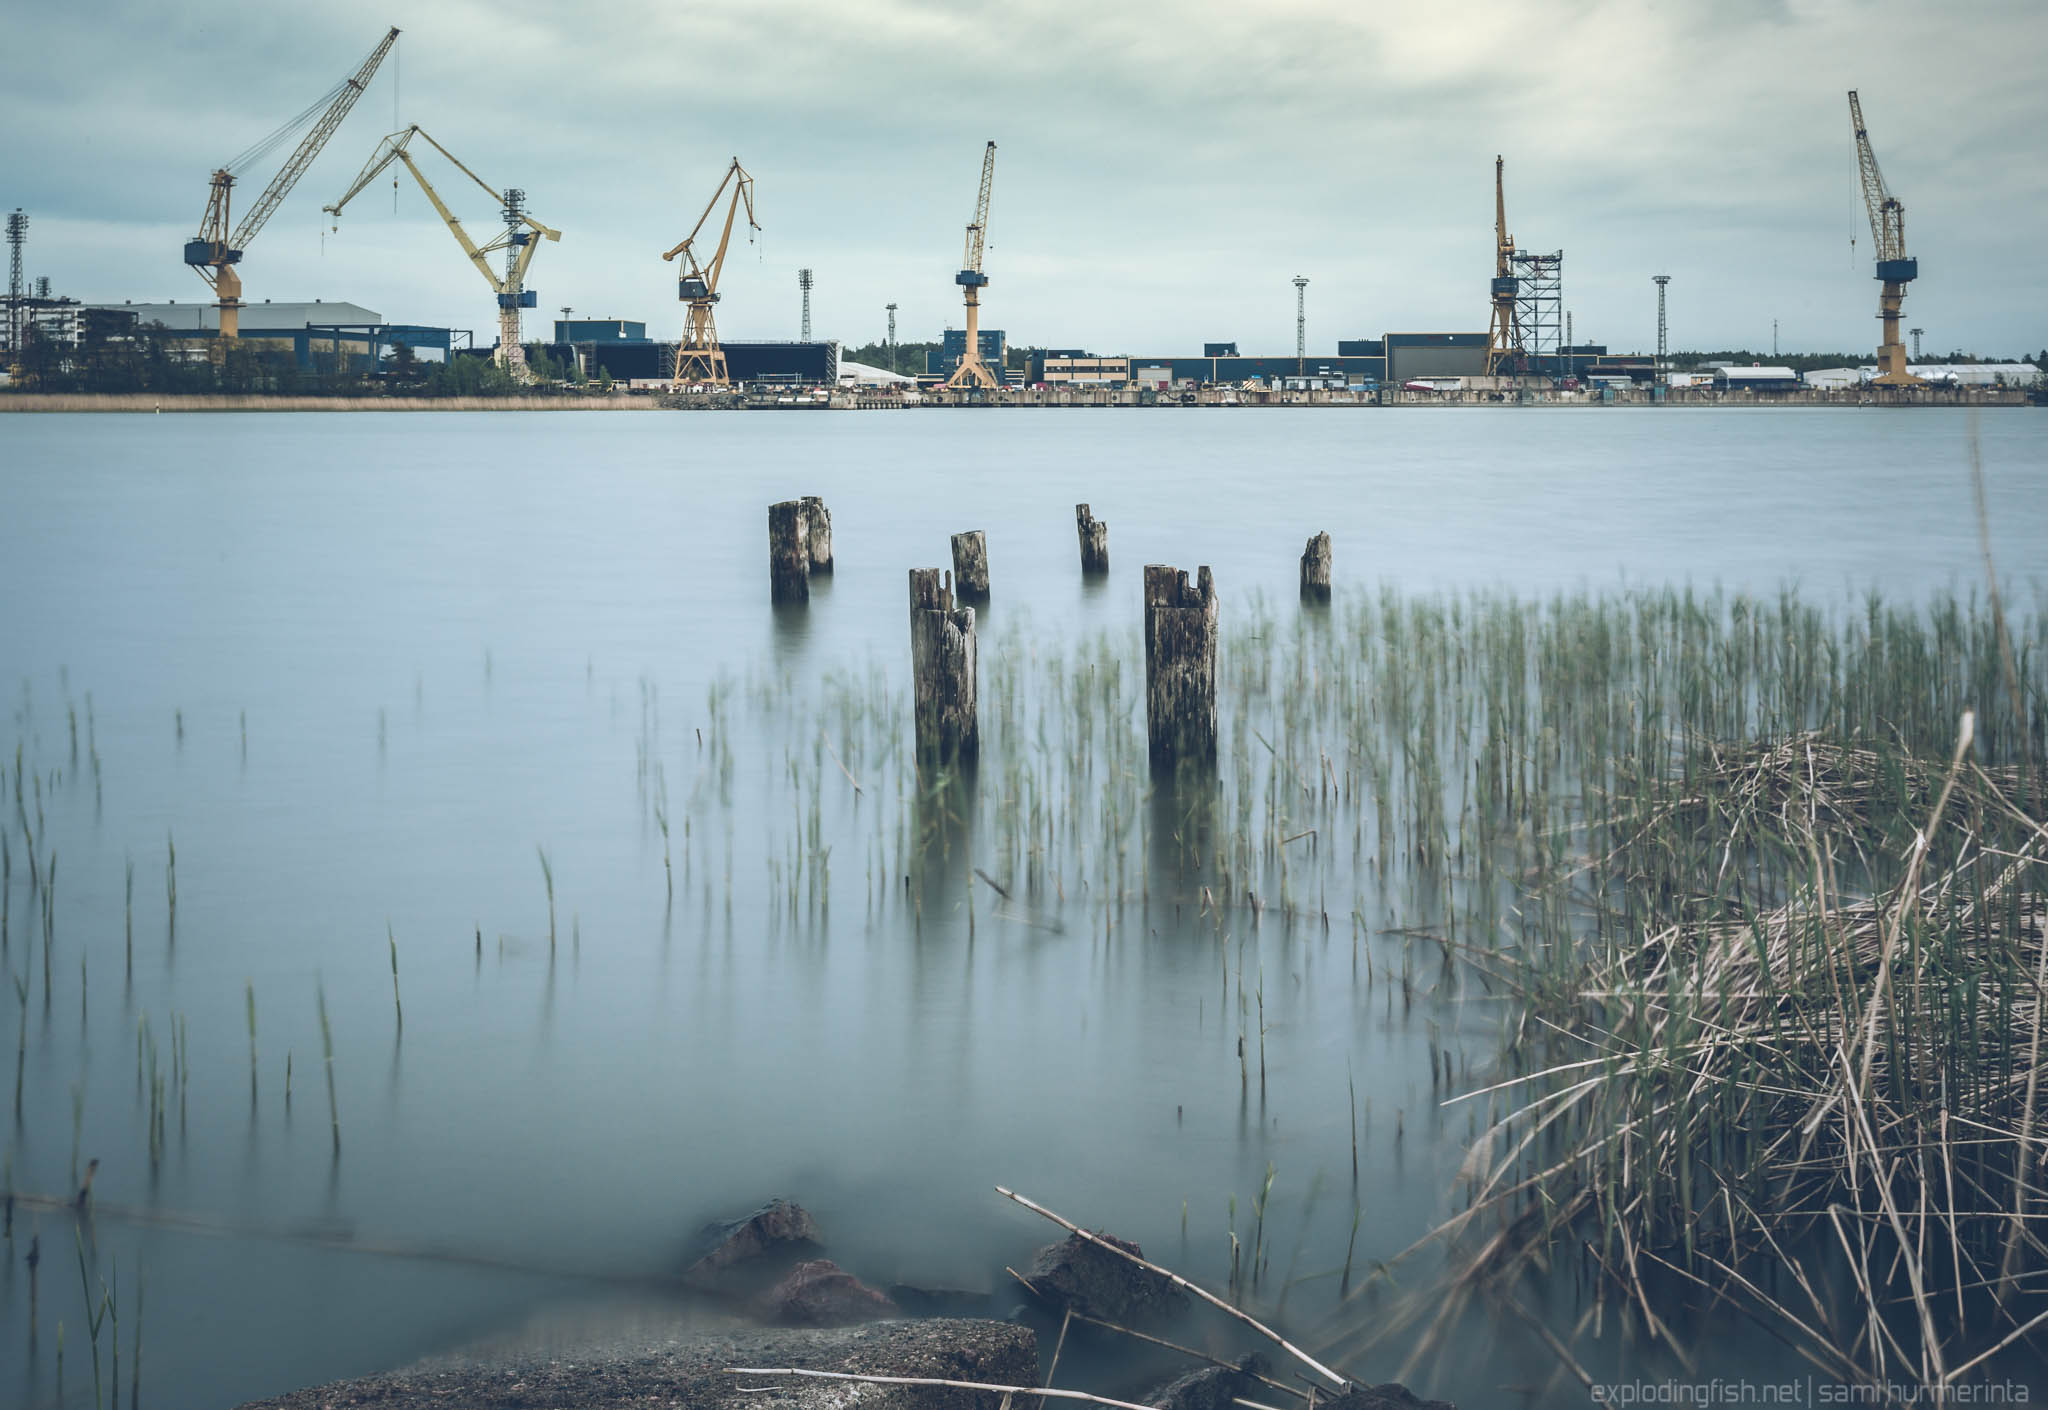 Perno Shipyard in Raisio